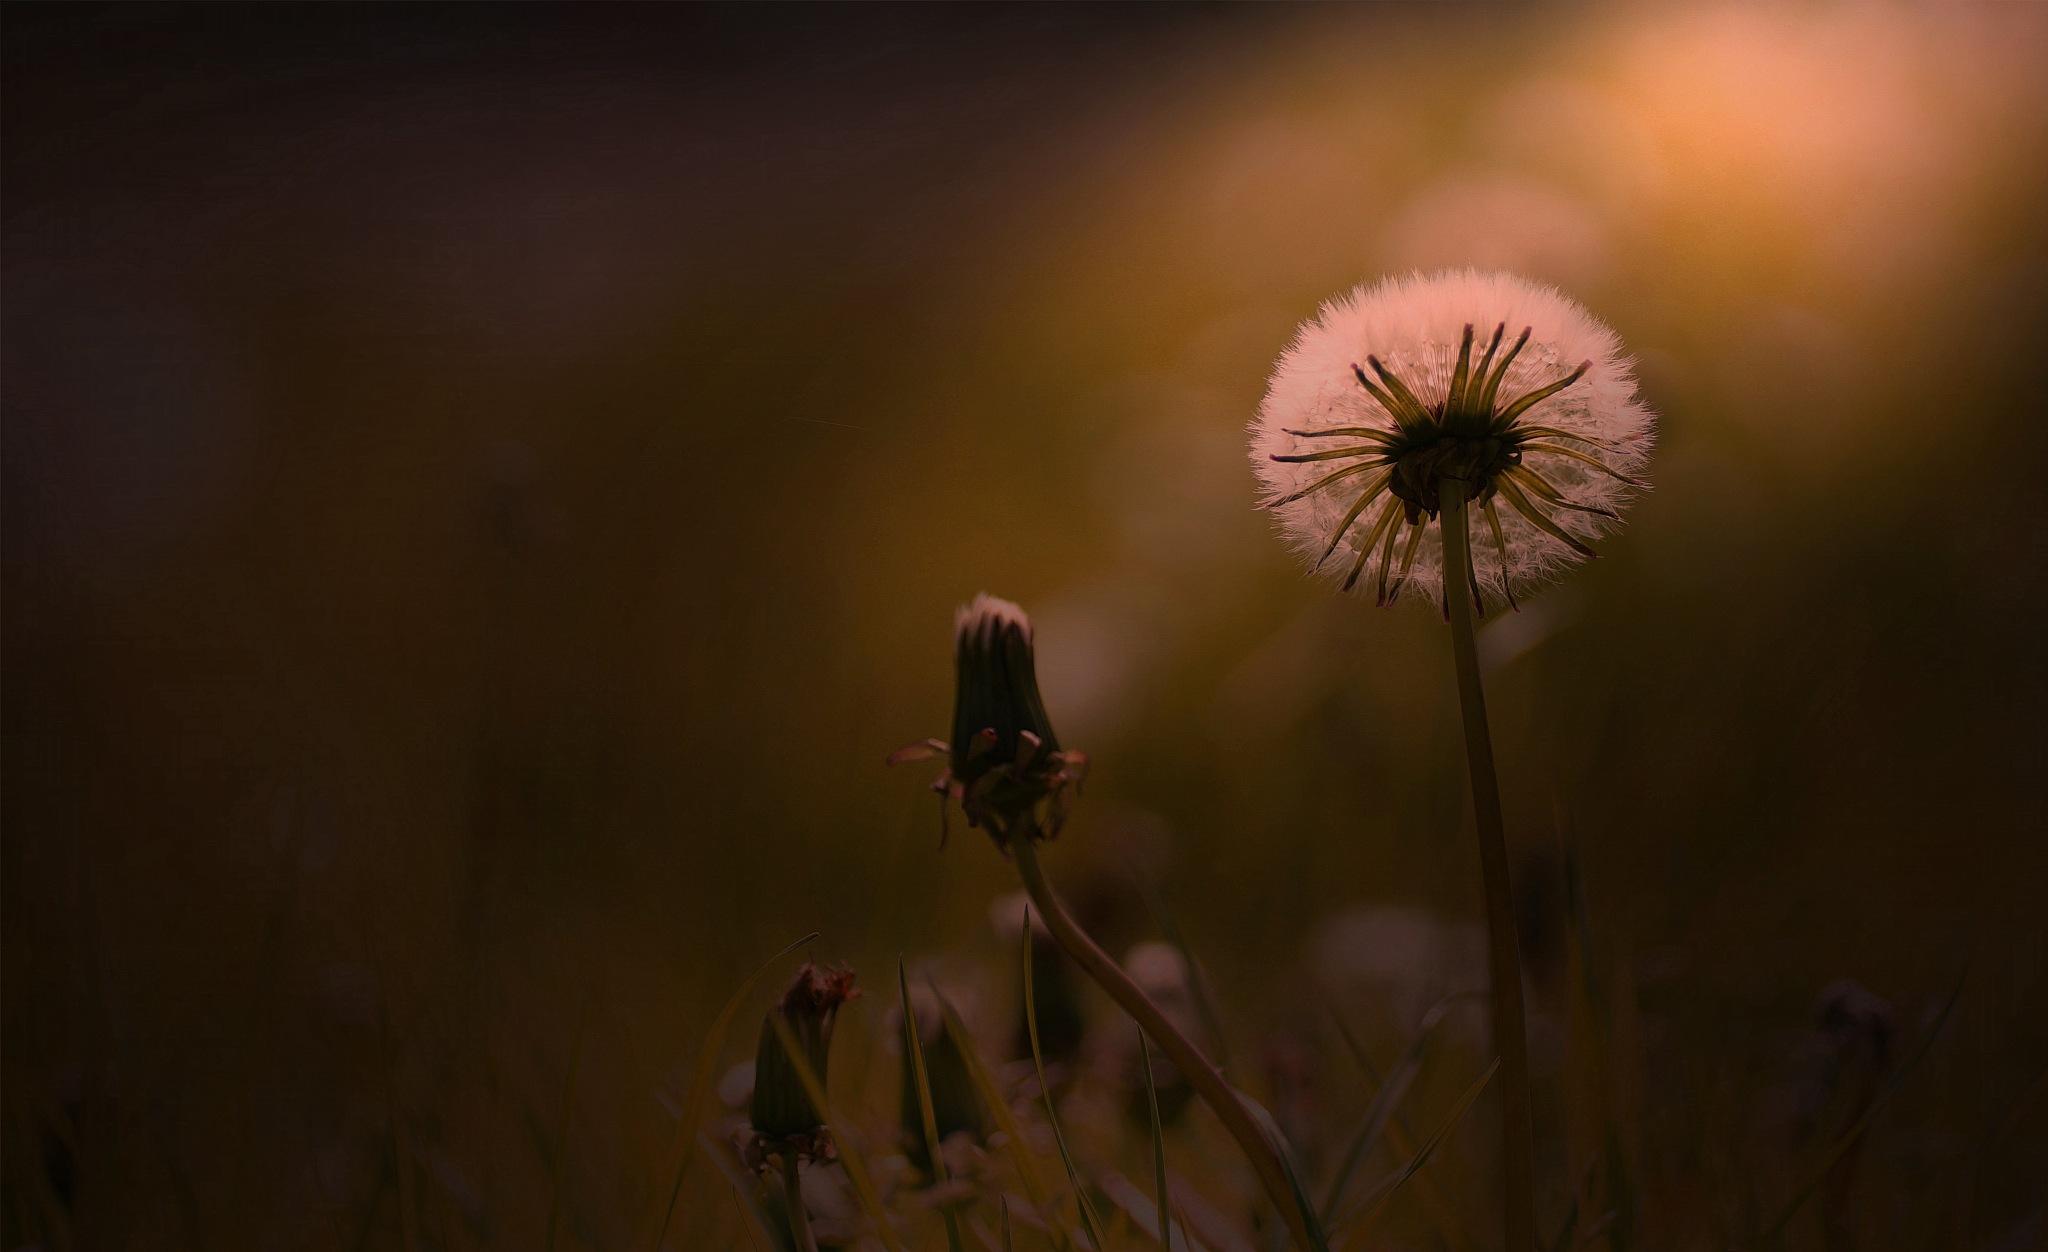 cheshire morning by navidqureshi